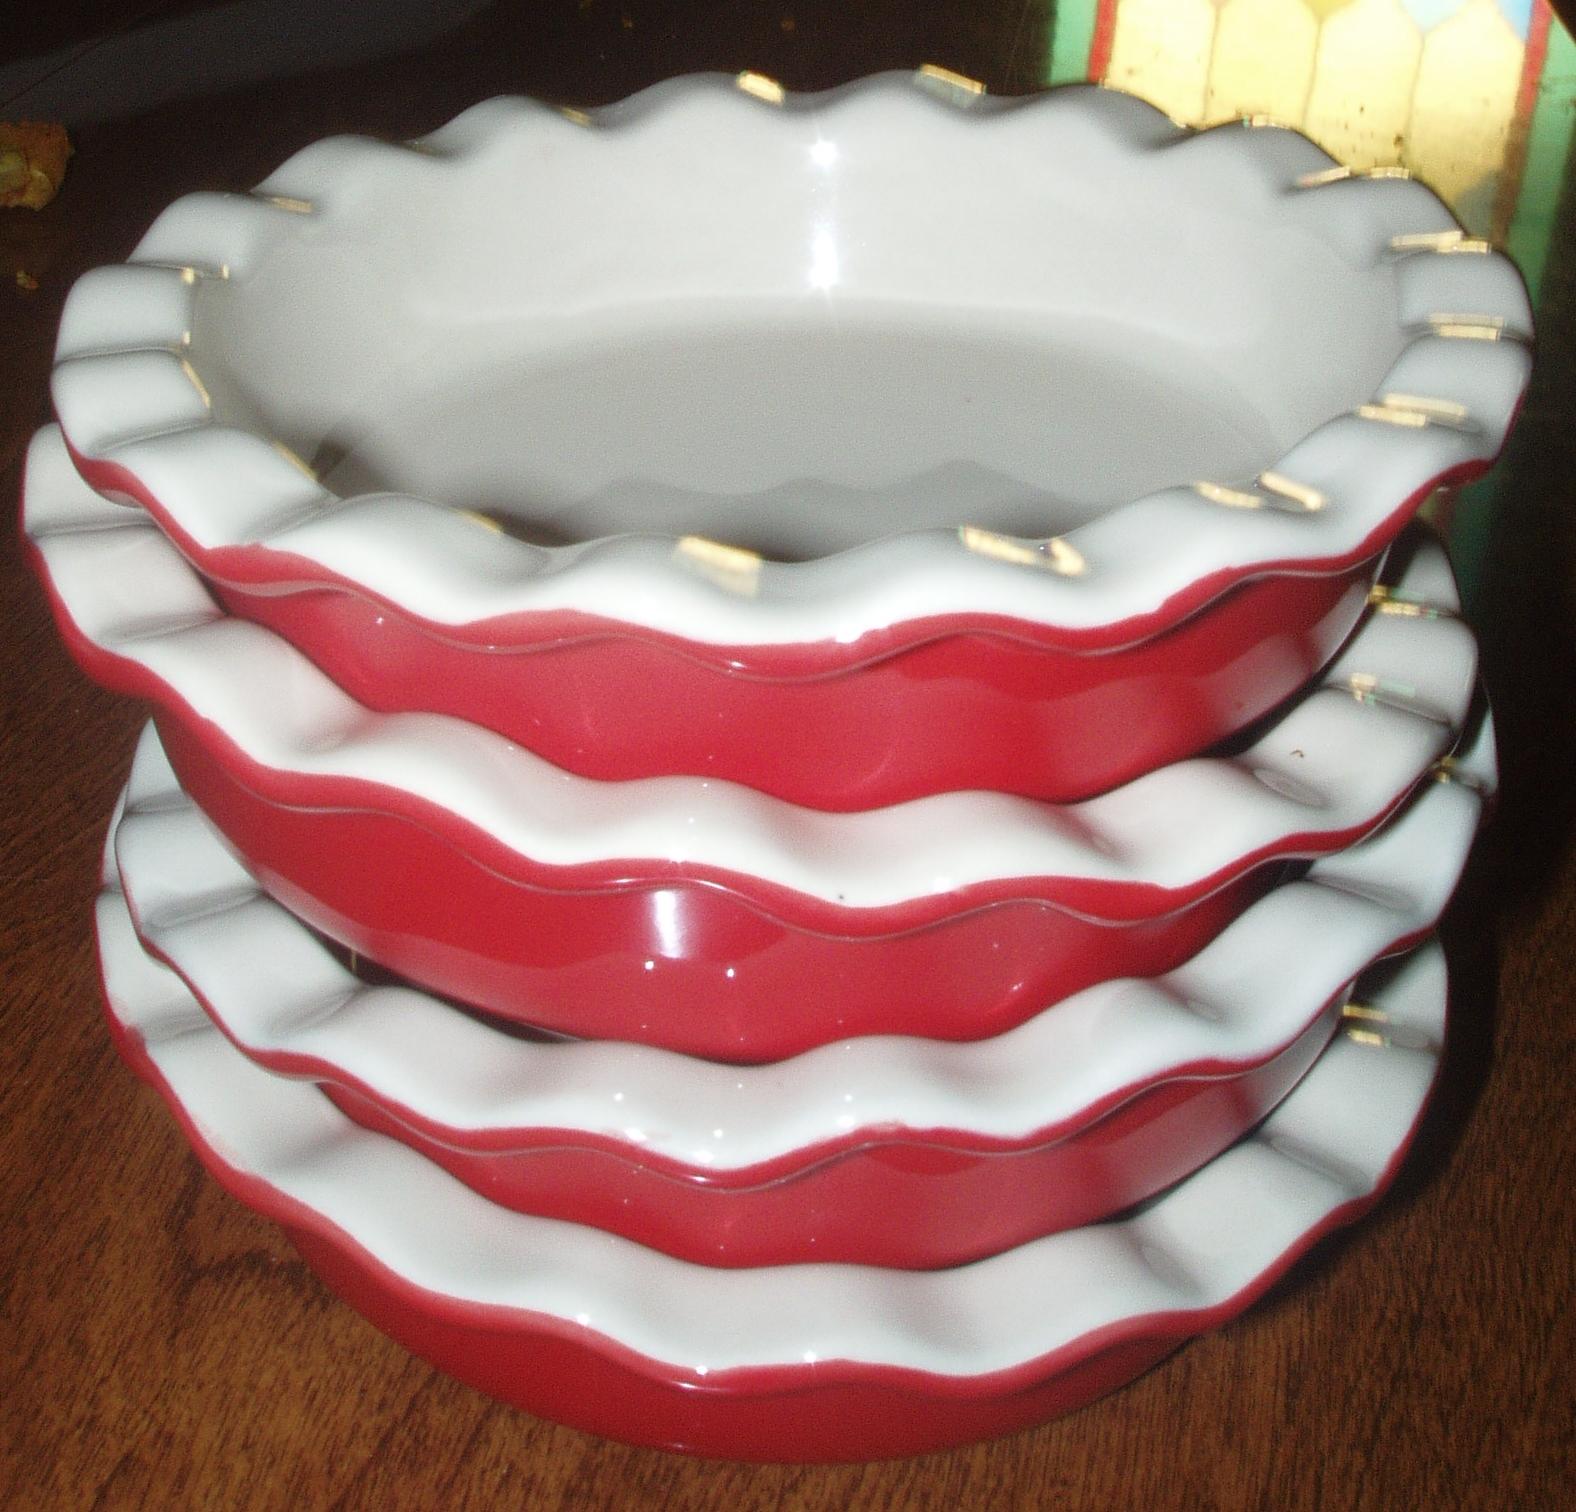 Small Pie Plates Amp Sc 1 St King Arthur Flour